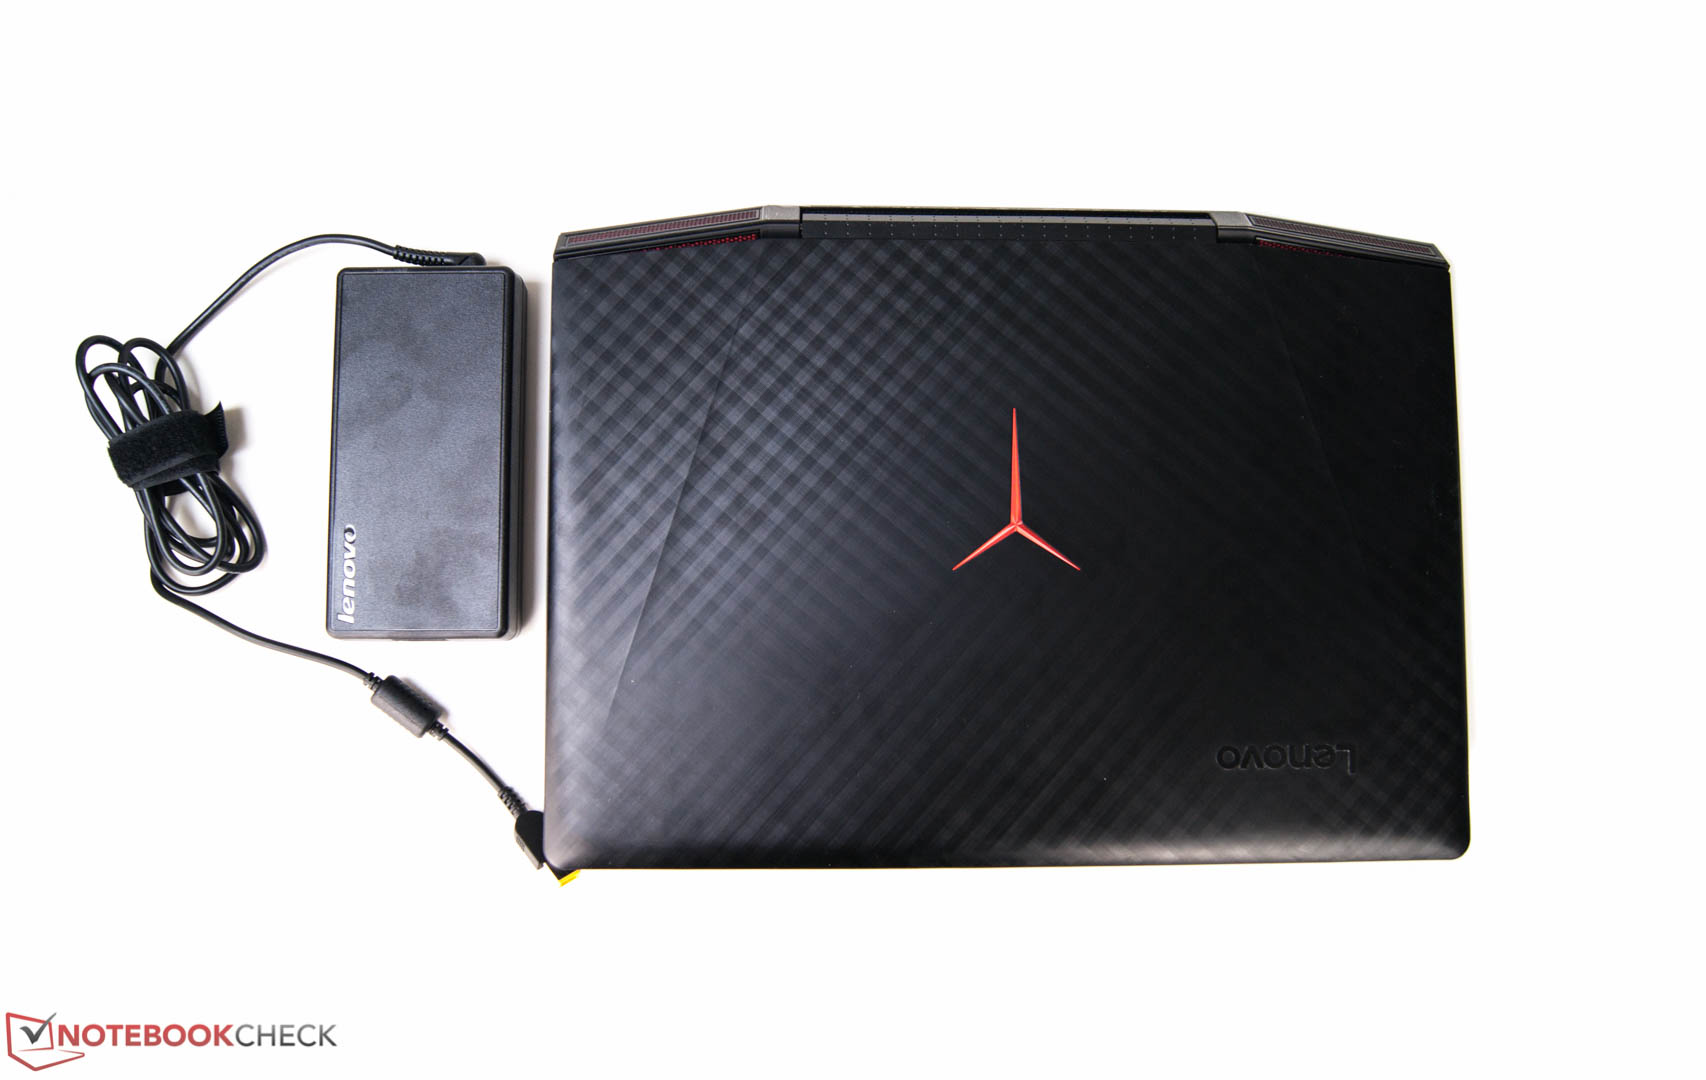 Lenovo Legion Y720 (7700HQ, Full-HD, GTX 1060) Laptop Review